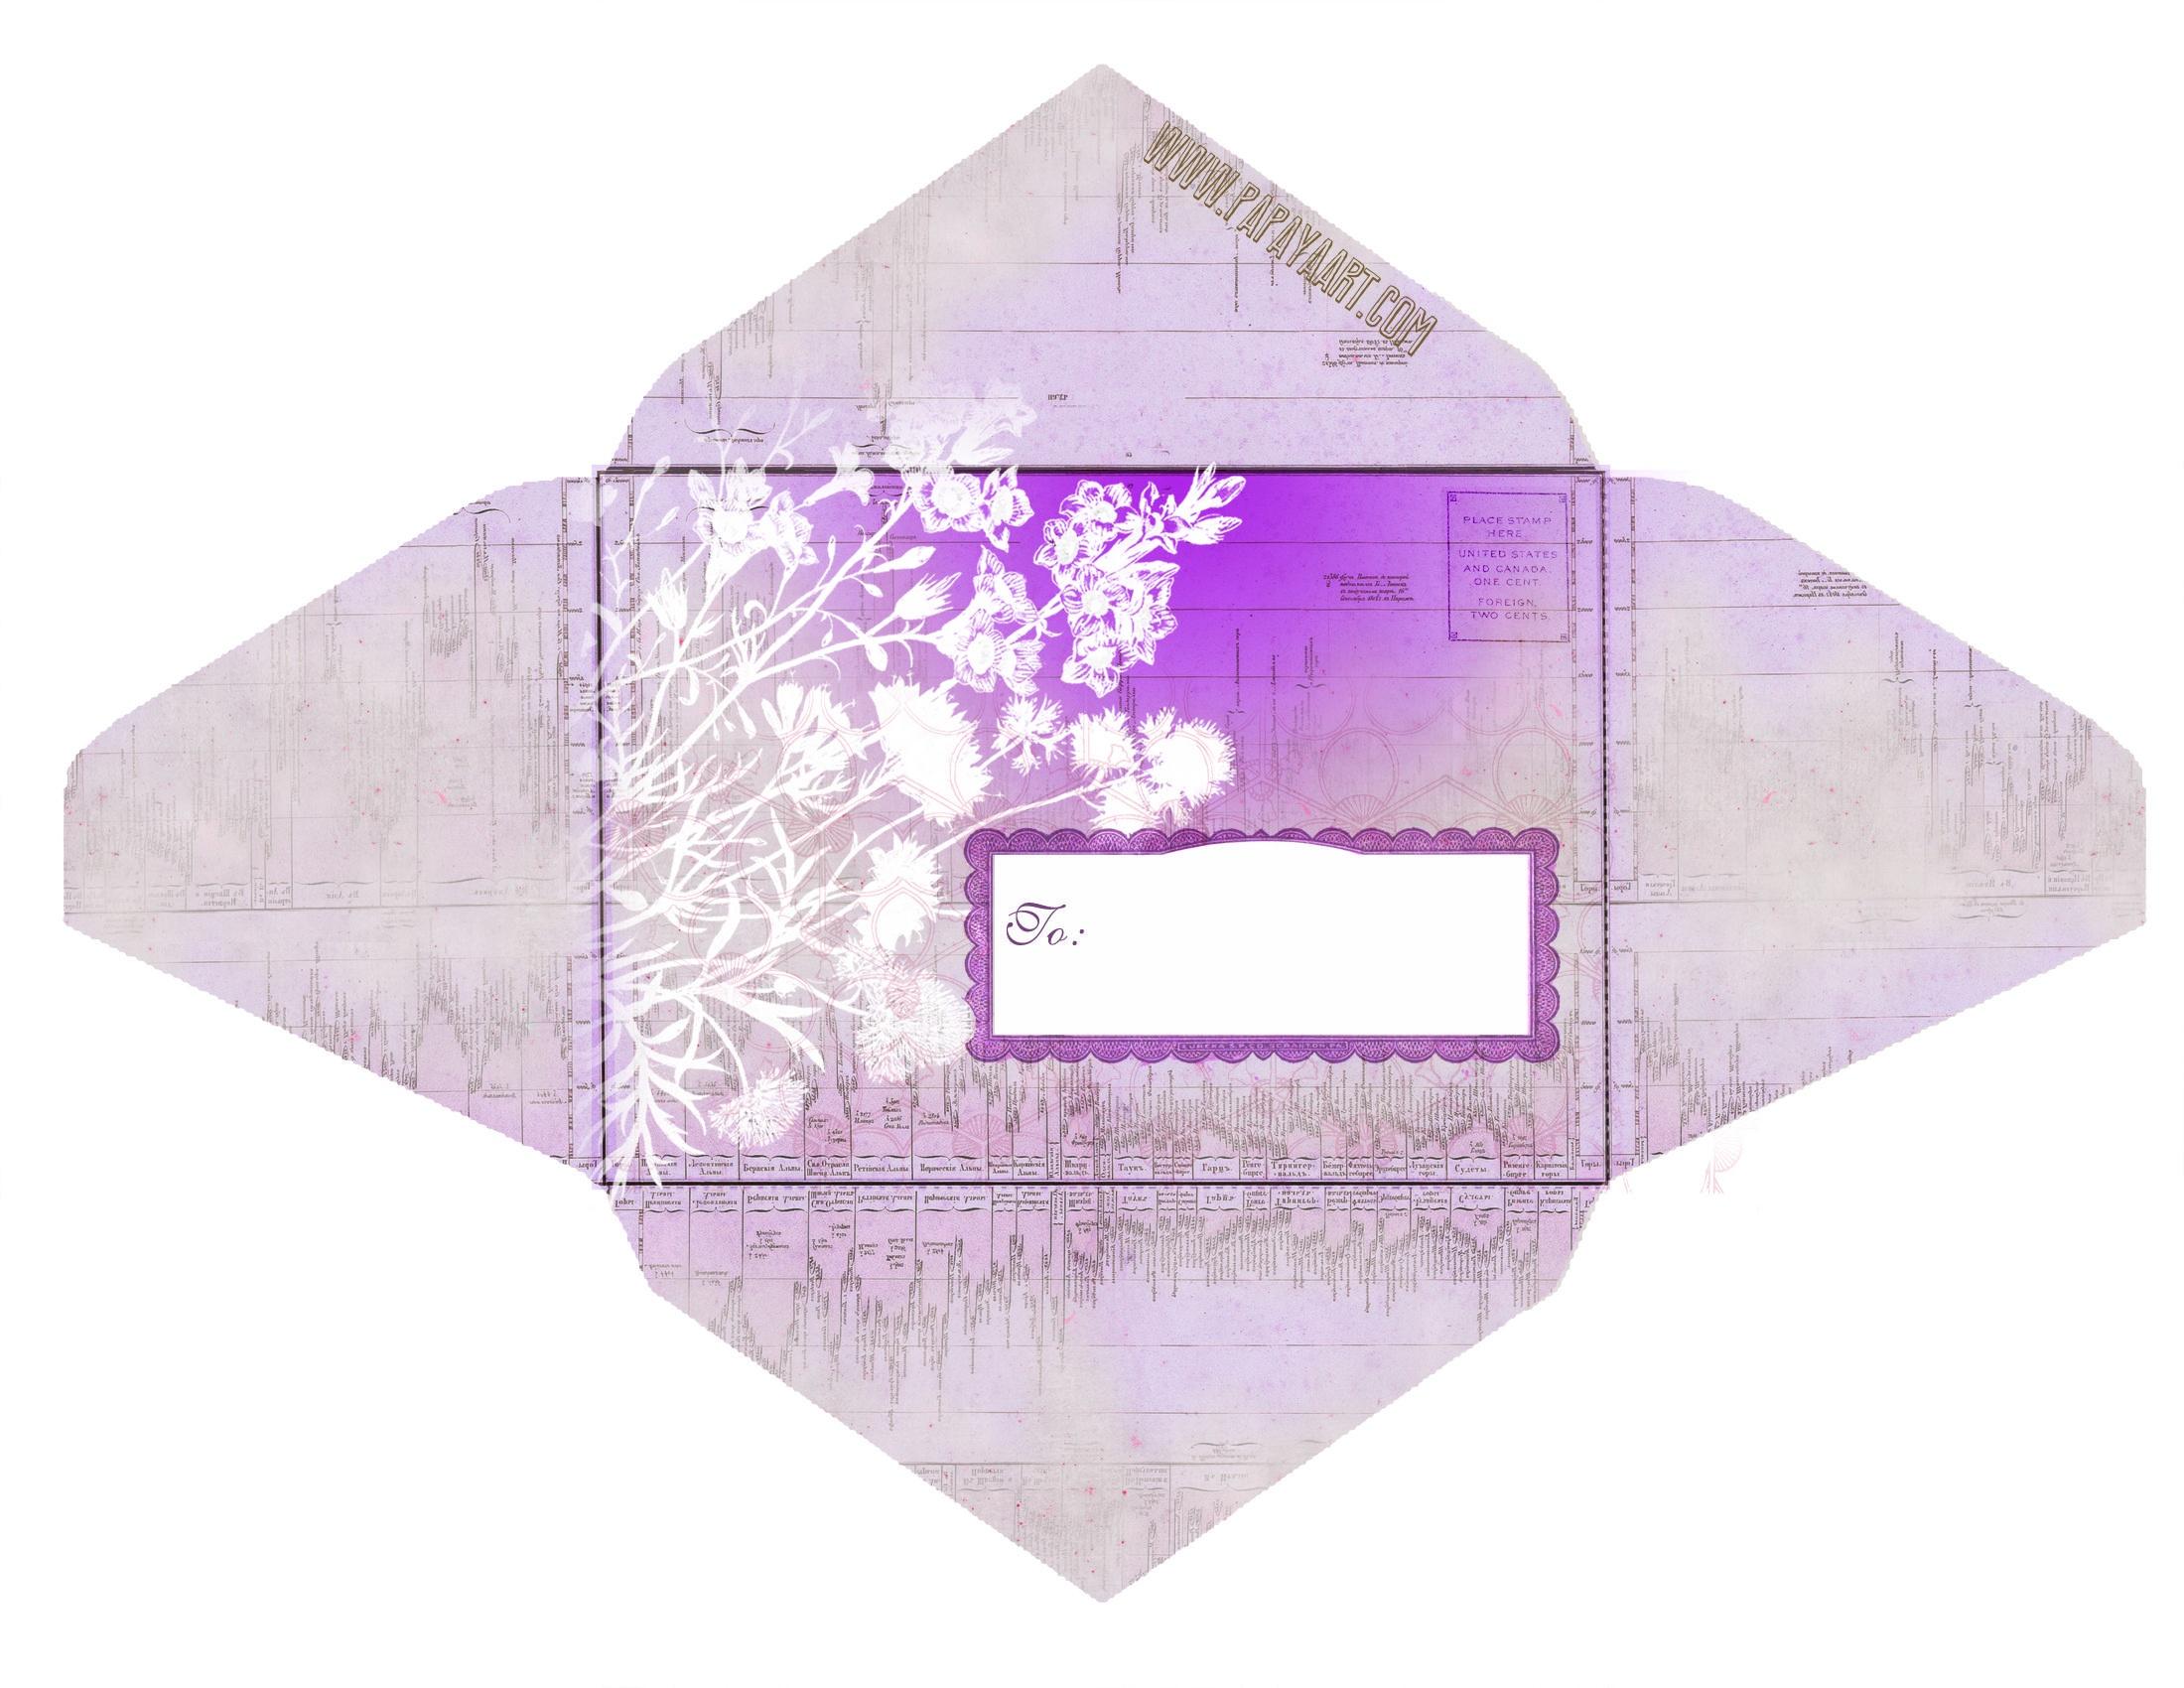 Free Printable Envelopes From Santa   Free Printable Envelope This - Free Printable Envelopes